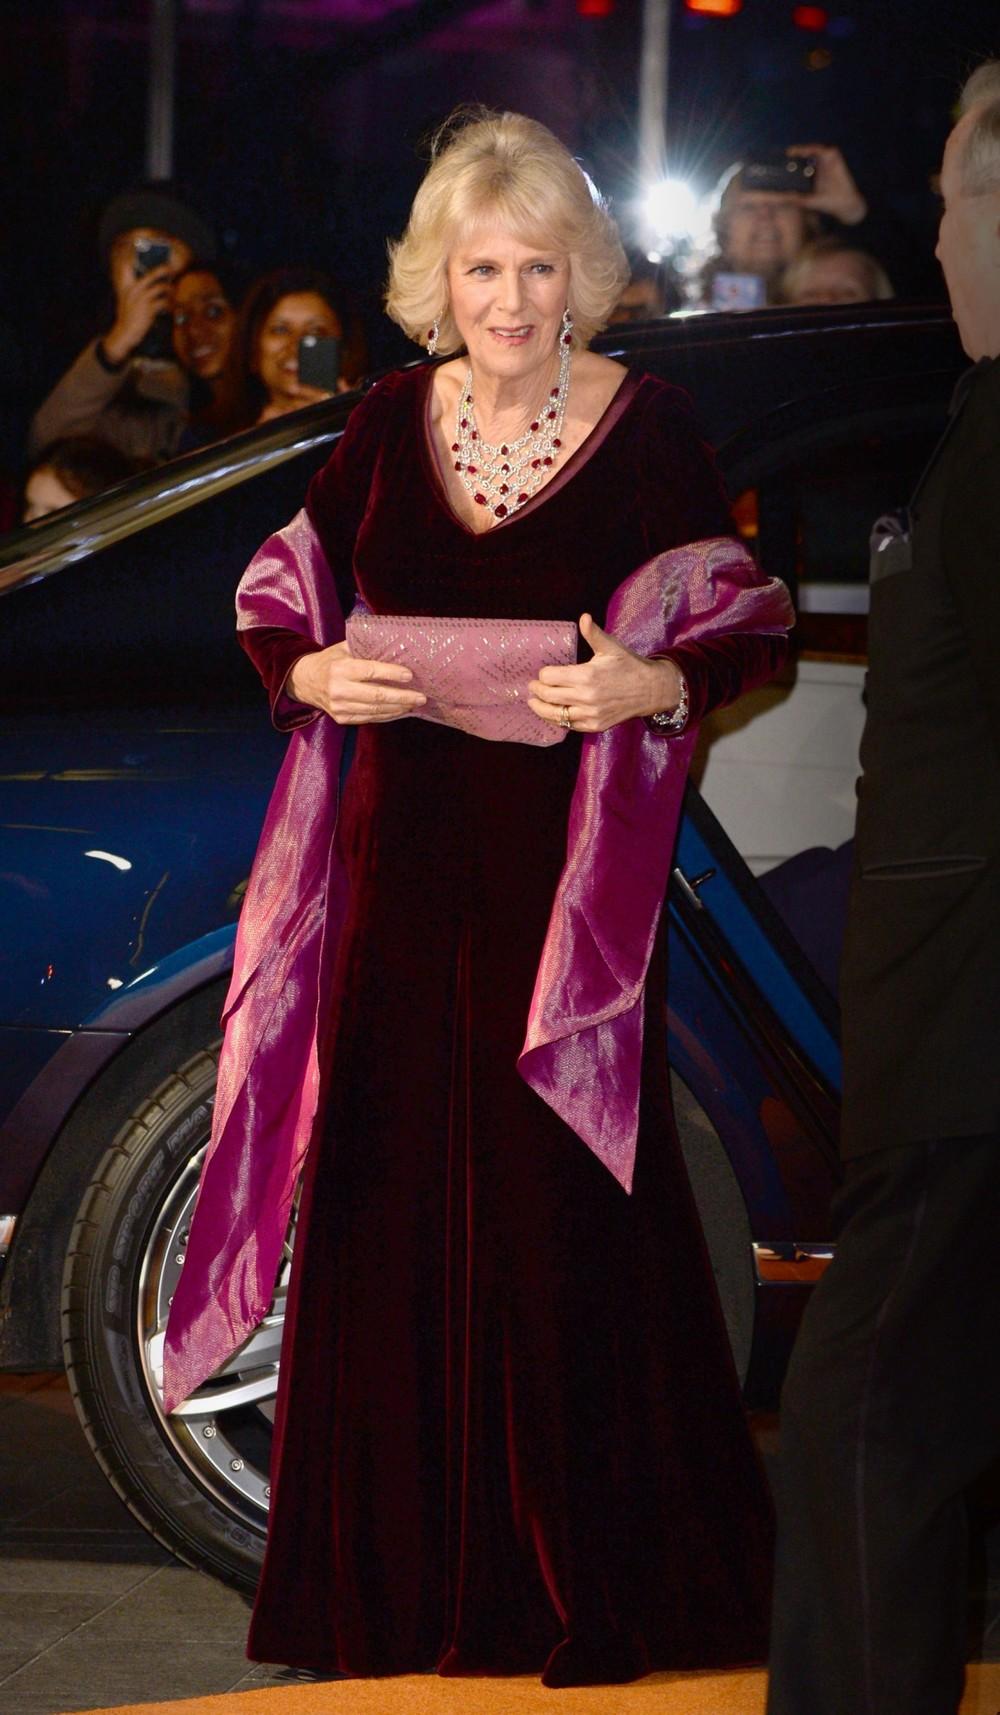 Camila the duchess of Cornwall